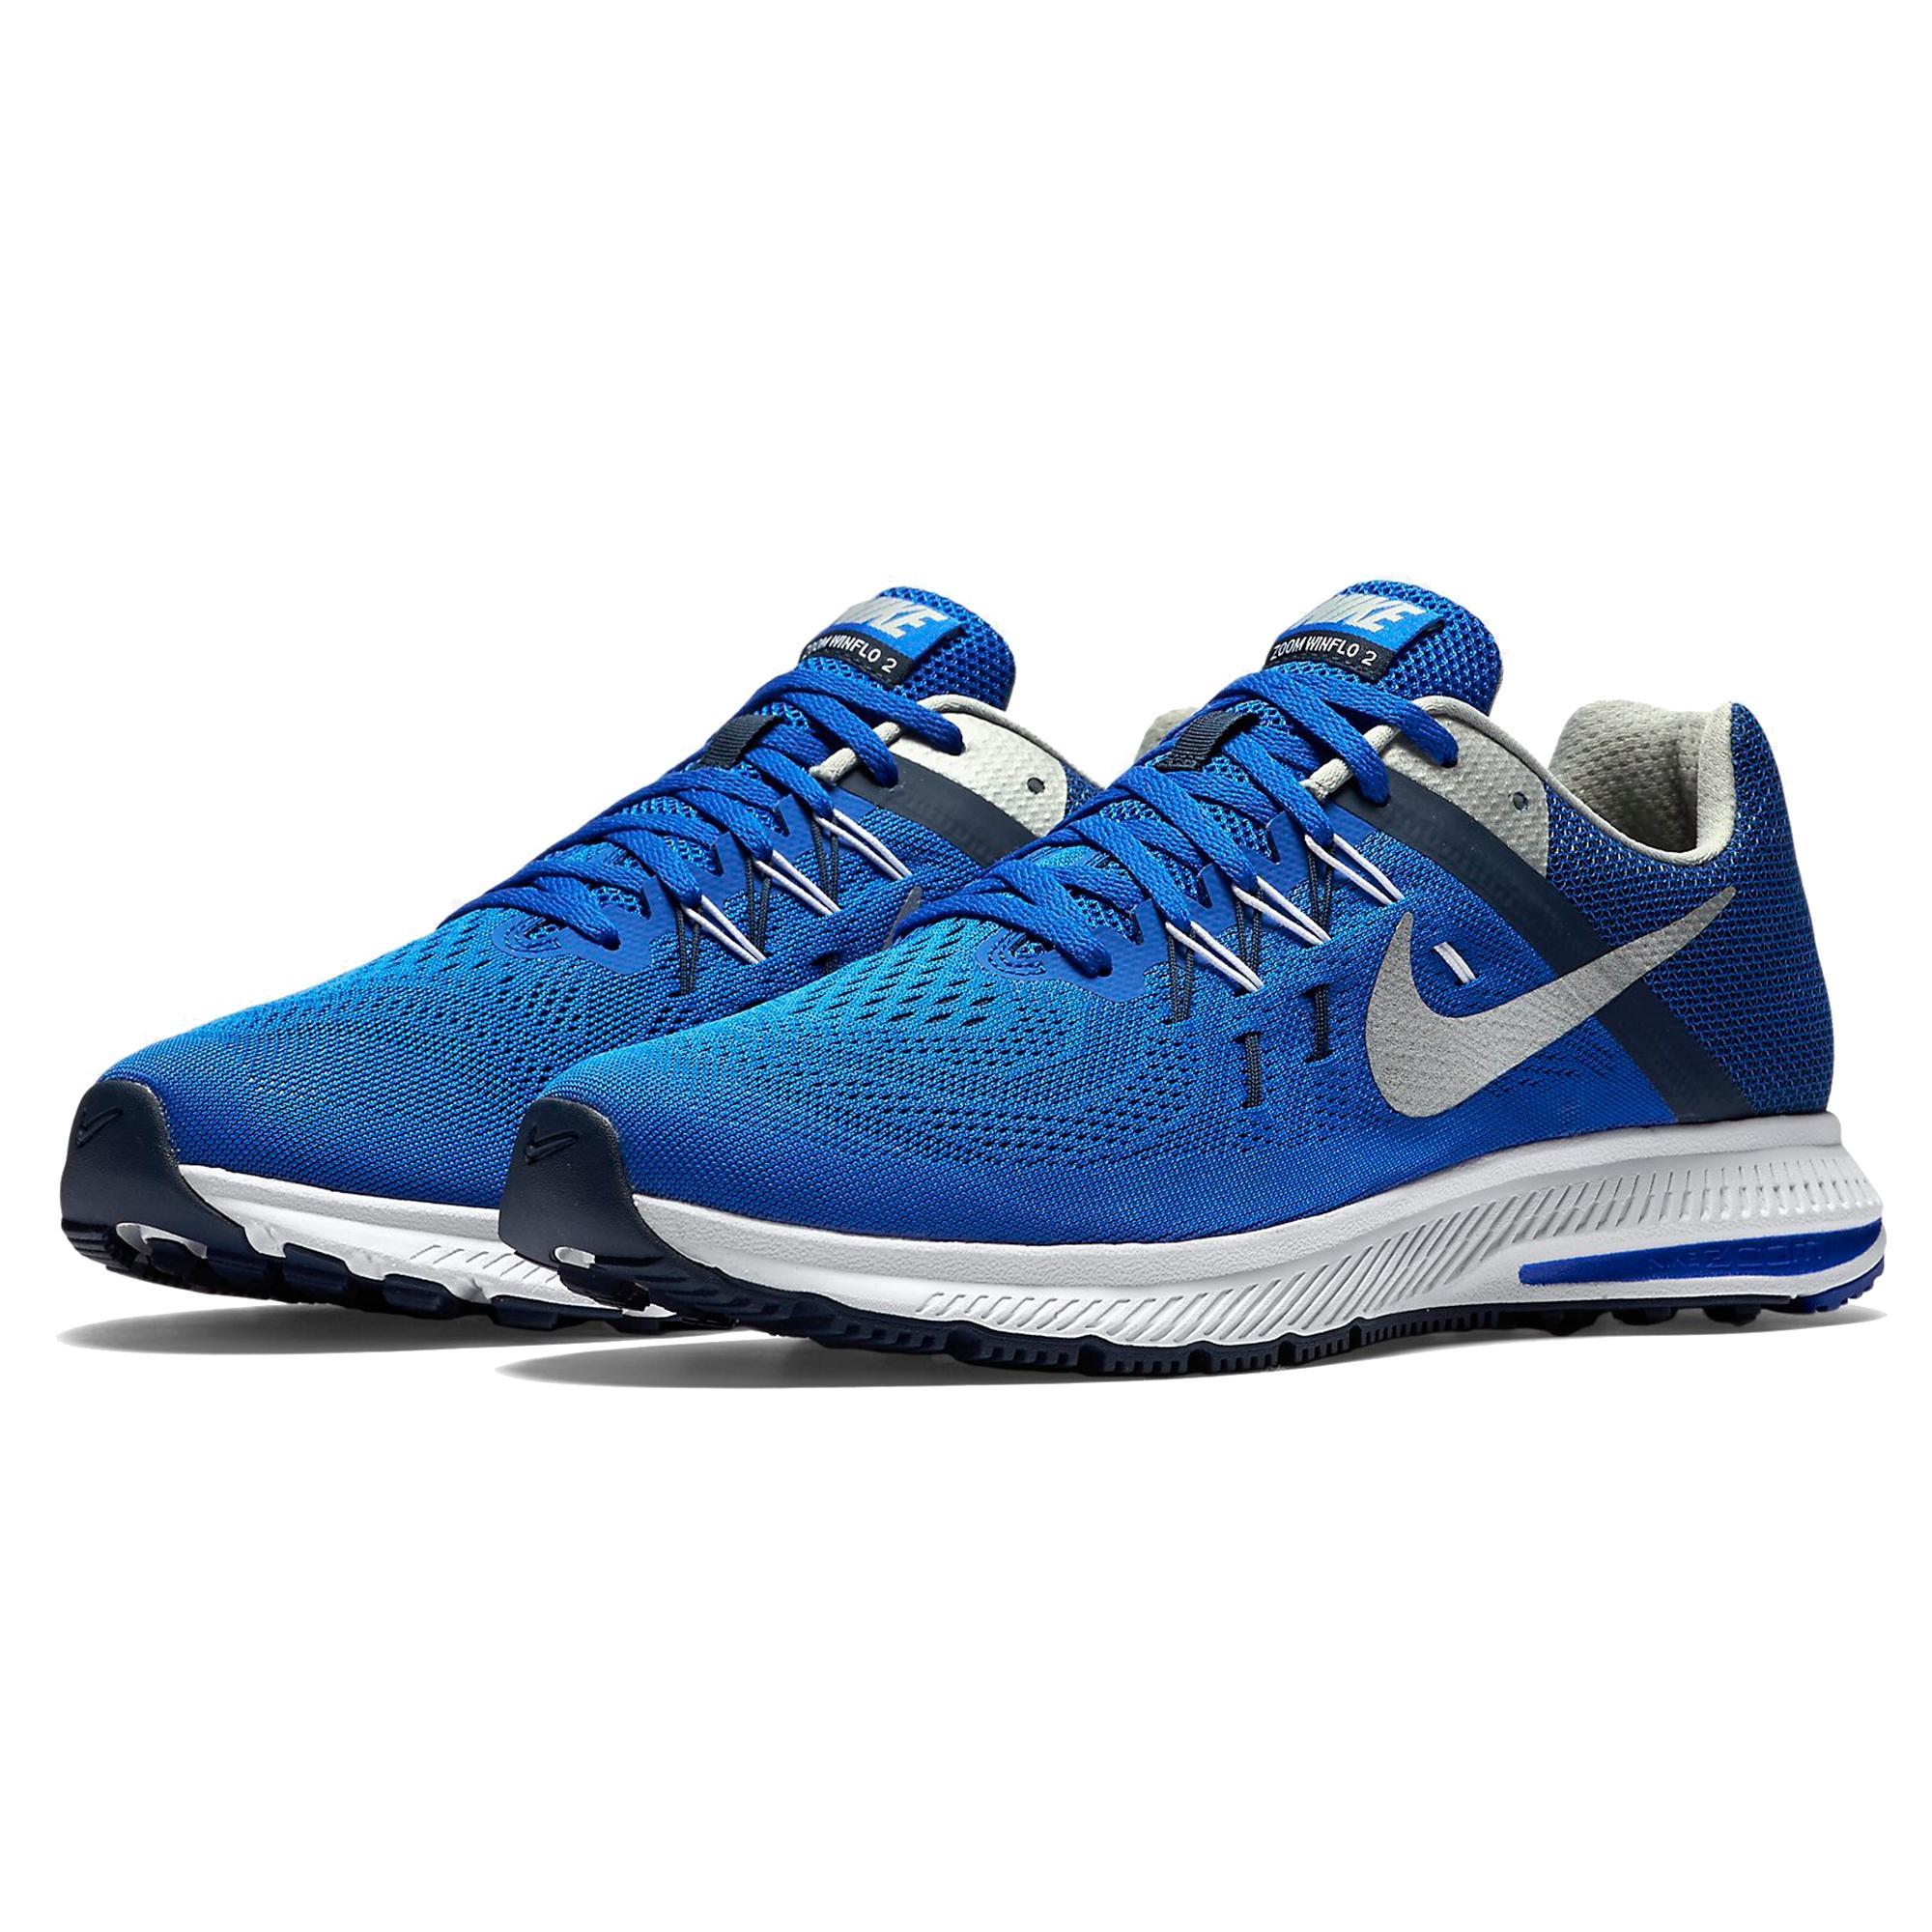 outlet store 93c5b a97c3 Nike Zoom Winflo 2 Erkek Spor Ayakkabı